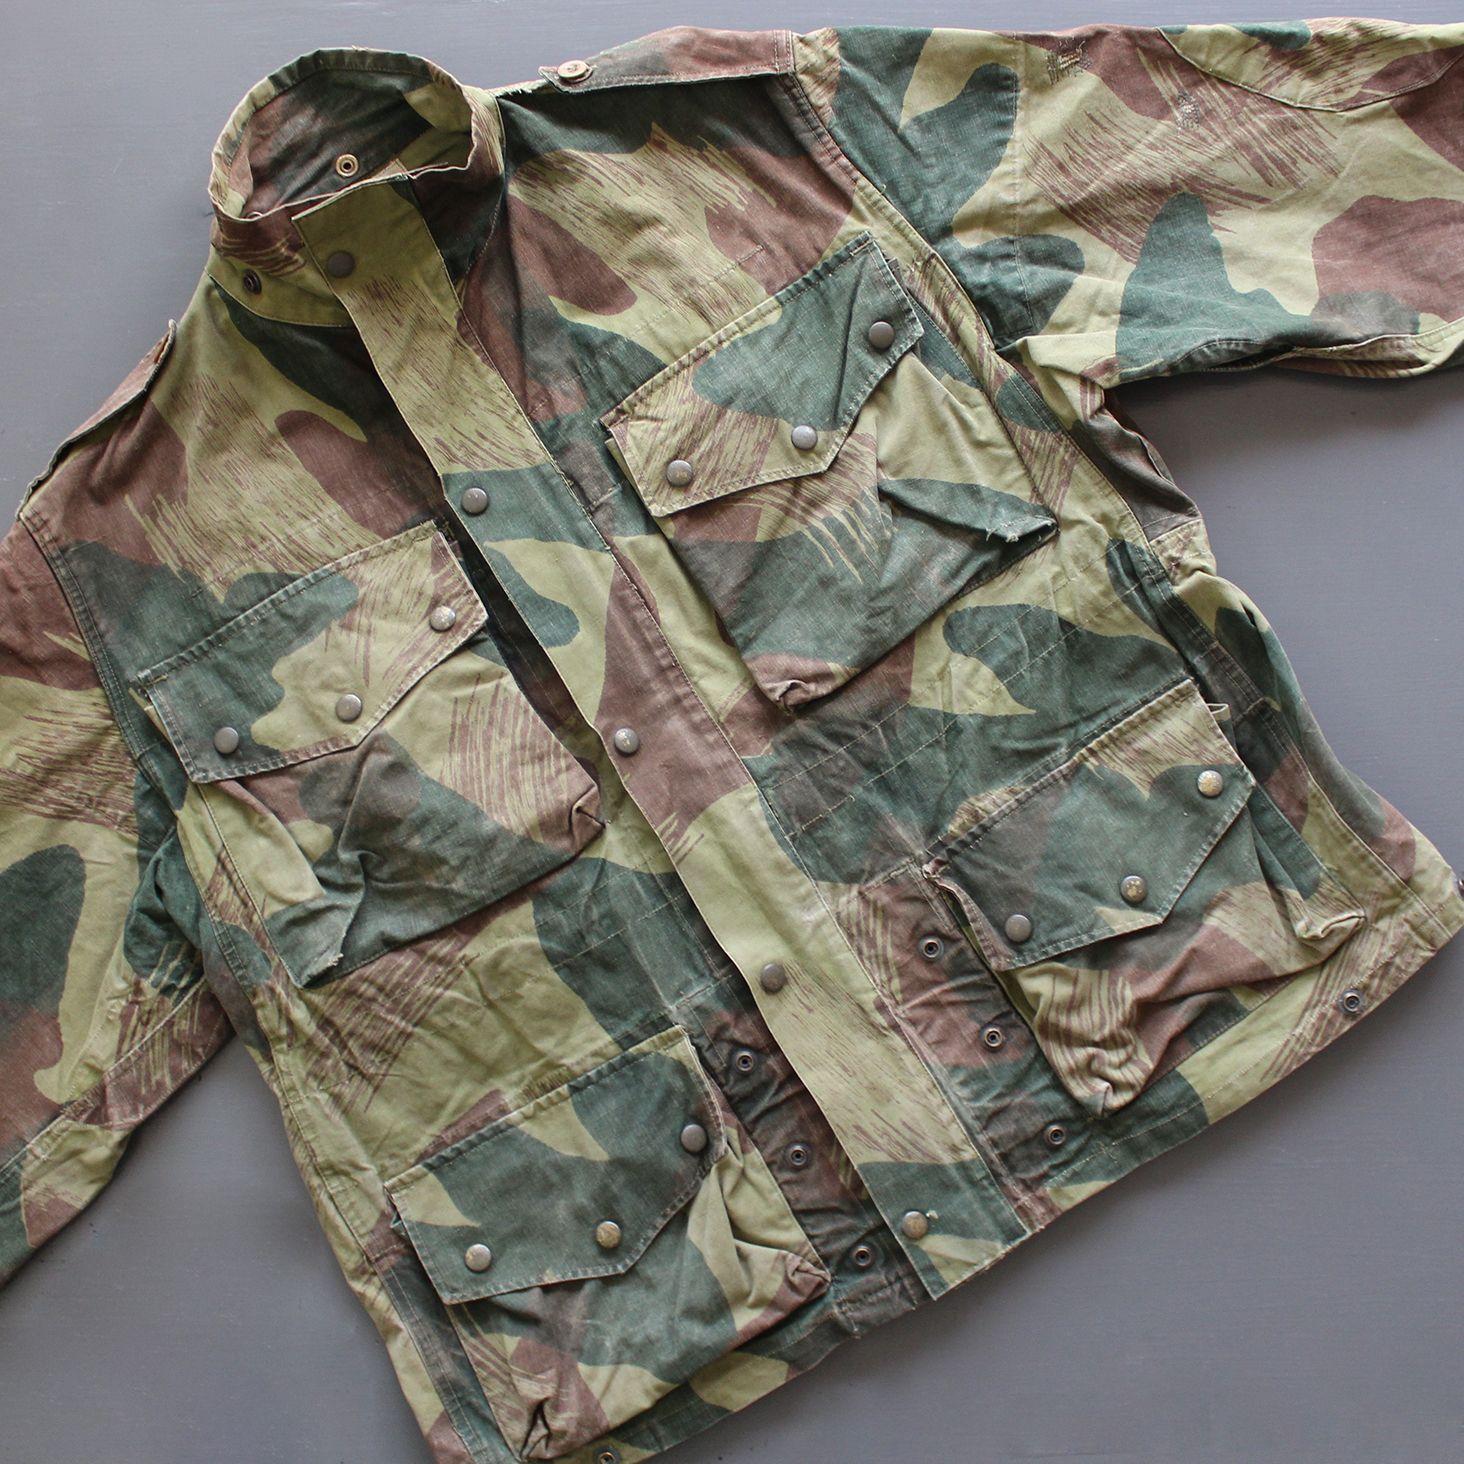 c8353ec19bbe4 1956 Belgian Army Para Jacket | Vintage (Military) in 2019 | Army ...